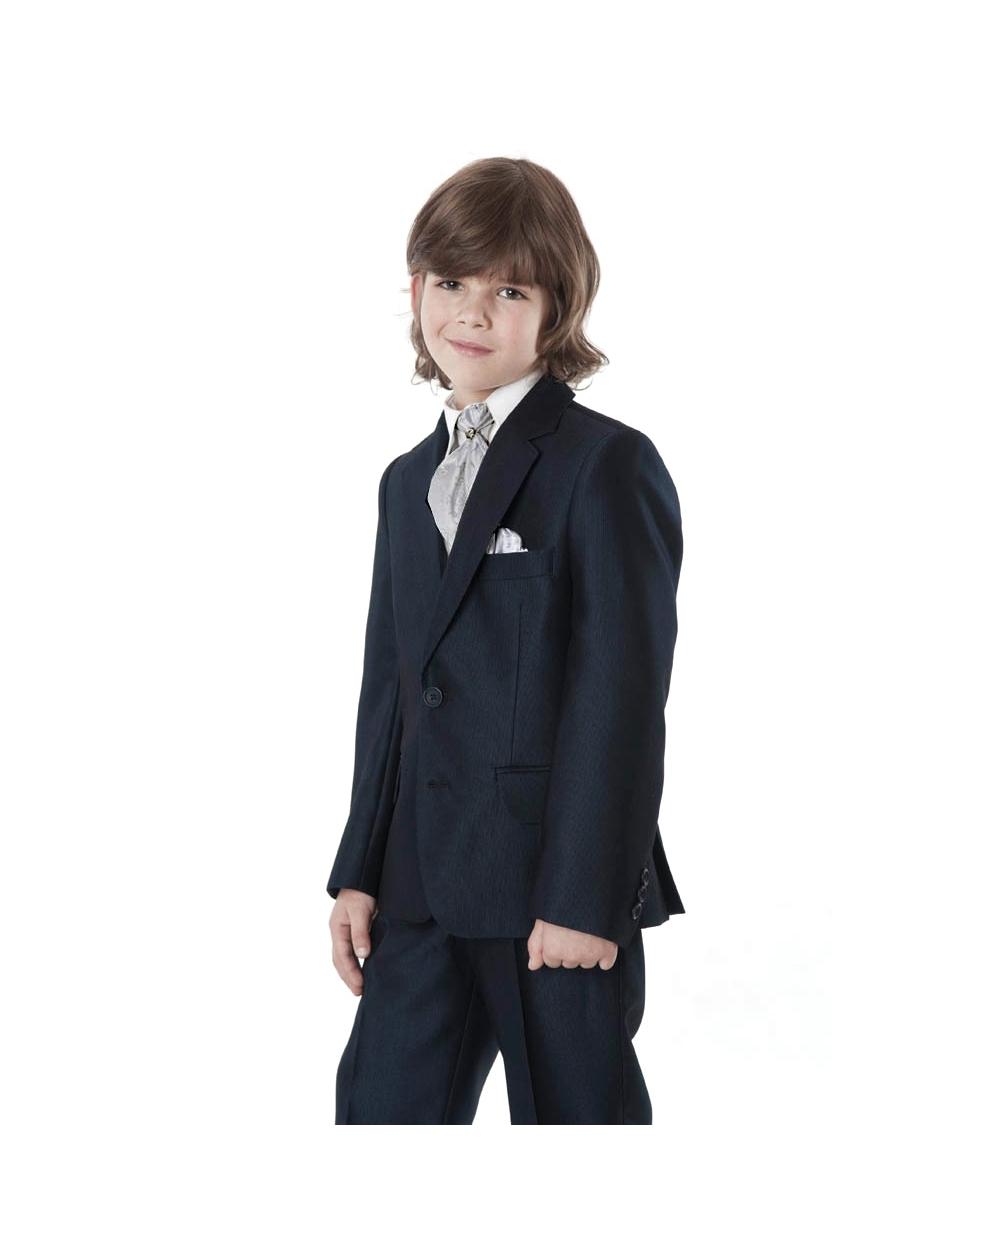 3f786cc9d1863 Garnitury dla dzieci, garnitury dla chłopców - Blumore.pl - Blumore.pl